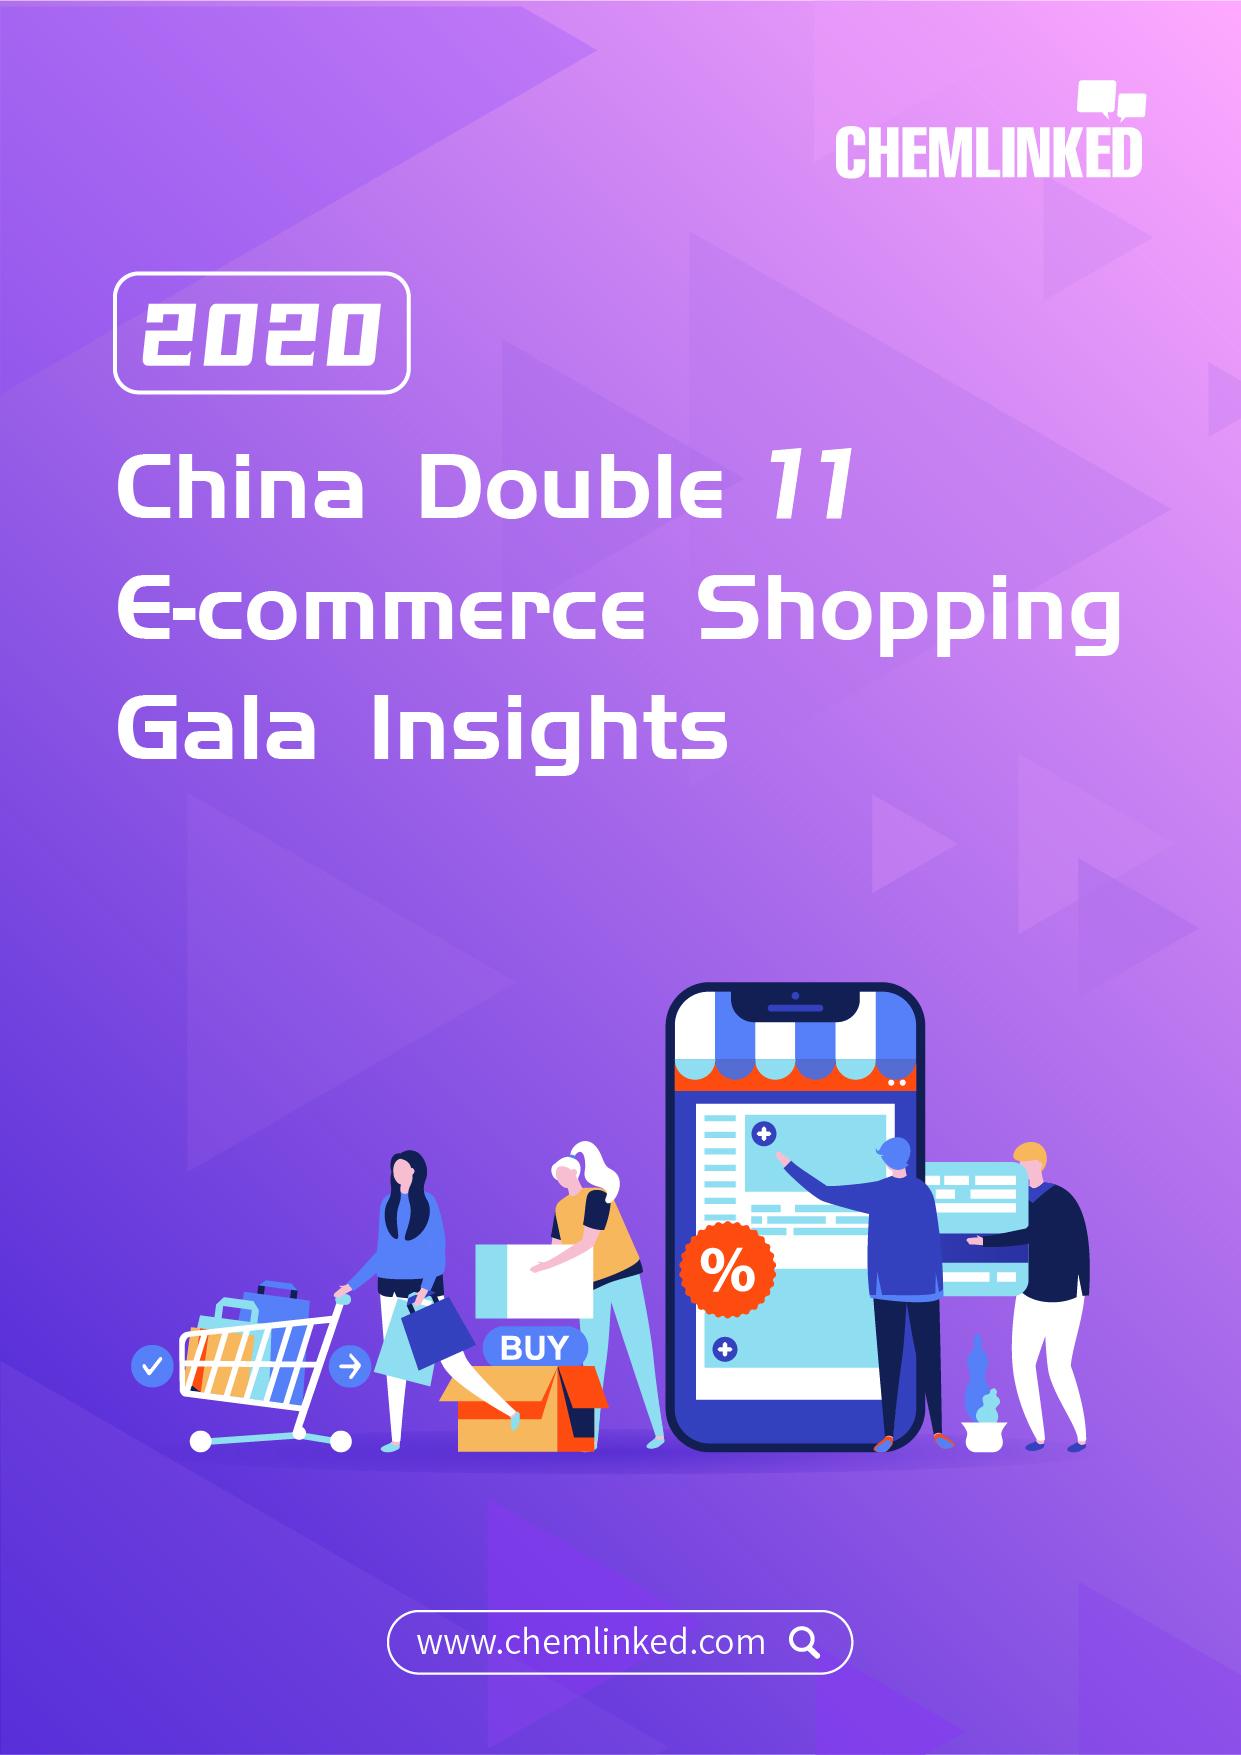 2020 China Double 11 E-commerce Shopping Gala Insights